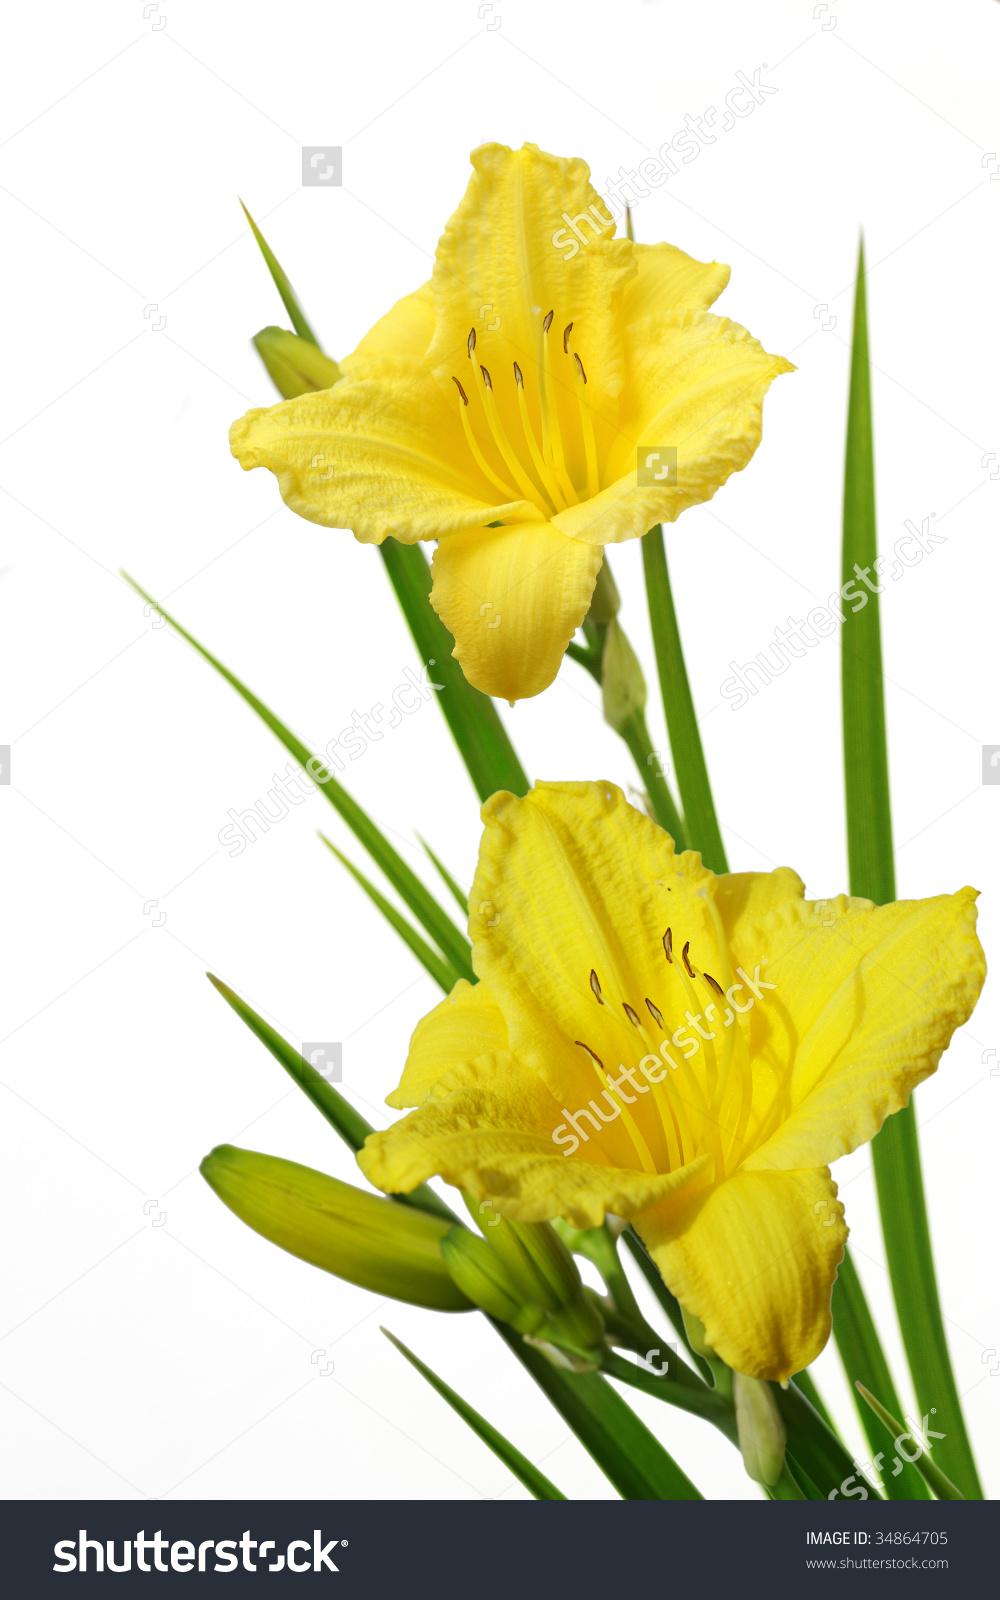 Bundle Of Yellow Daylily Flower Isolated On White Stock Photo.